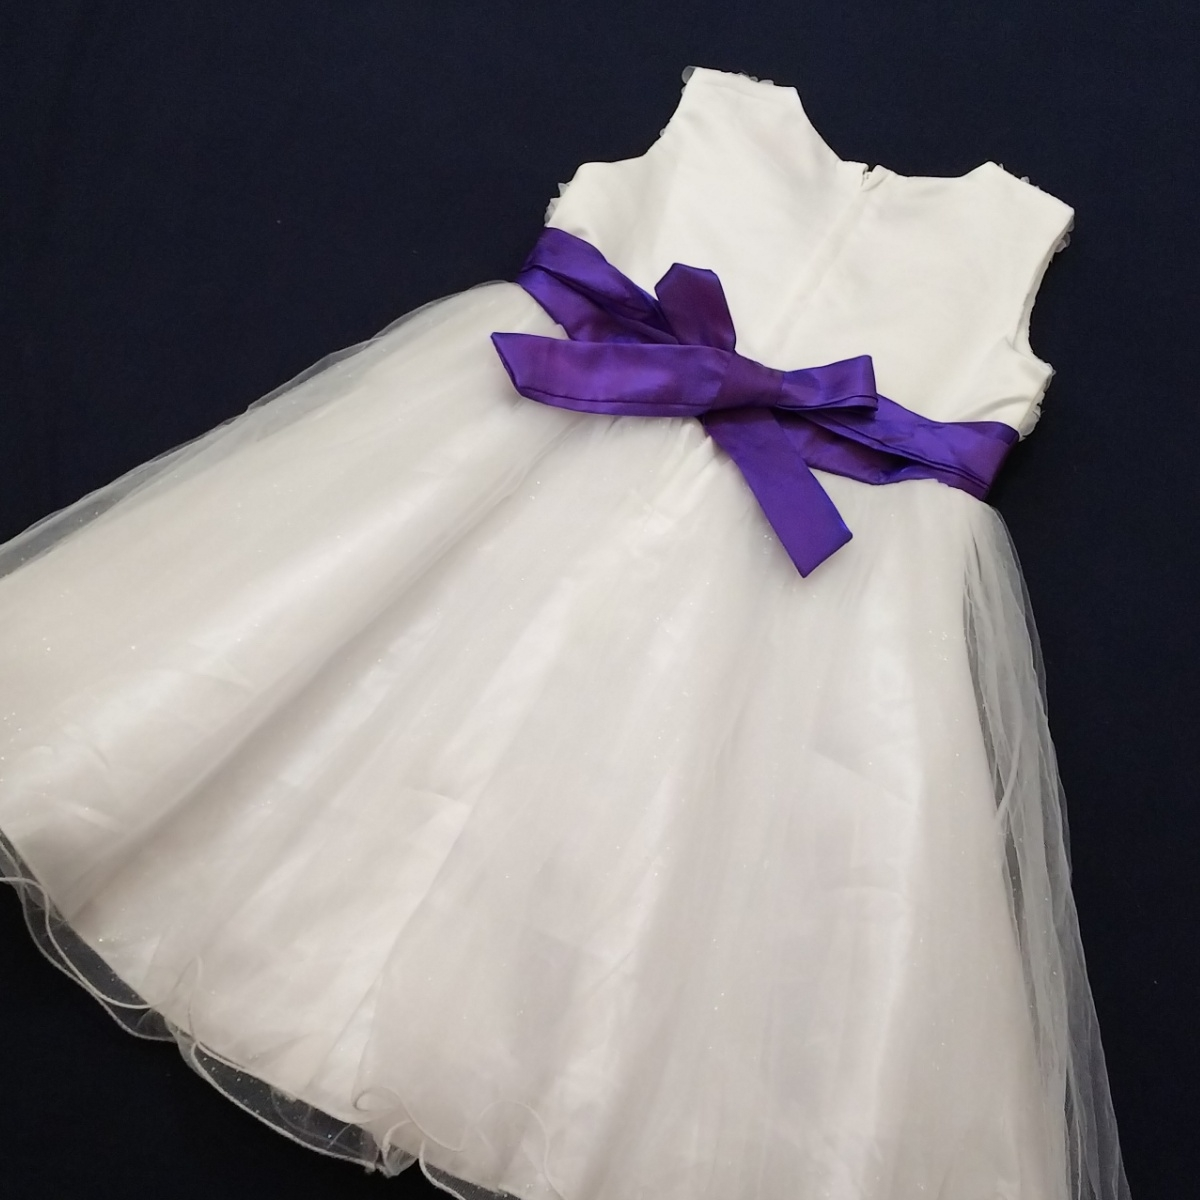 *FI5 AiMengBaby インポート 150 女の子 女子 フォーマル ドレス ワンピース ノースリーブ 白 紫 パープル 花 リボン 発表会 セレモニー_画像5